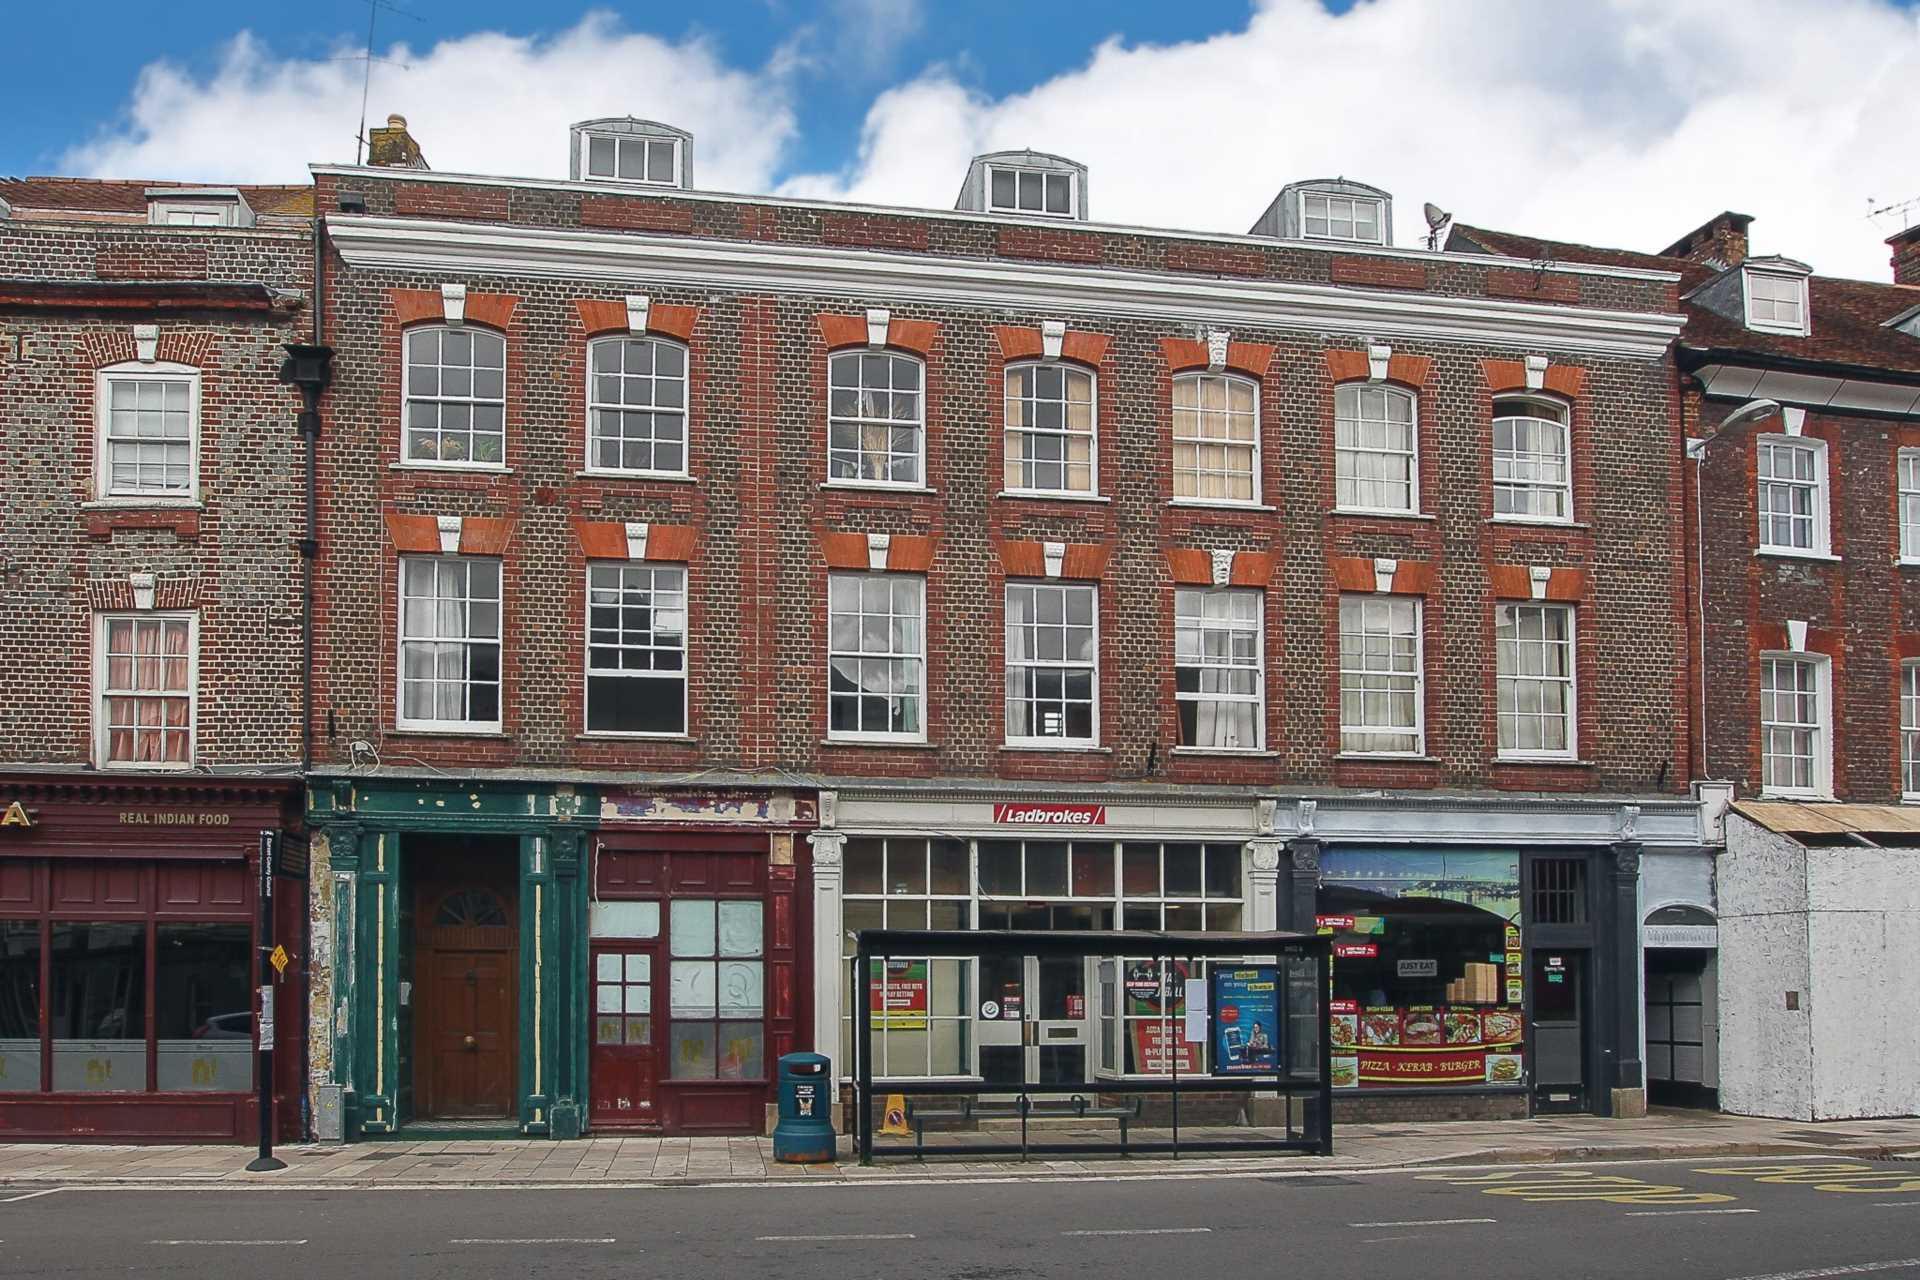 2 bed flat for sale in Pliskin Chambers, West Street, Blandford Forum, Blandford Forum 0